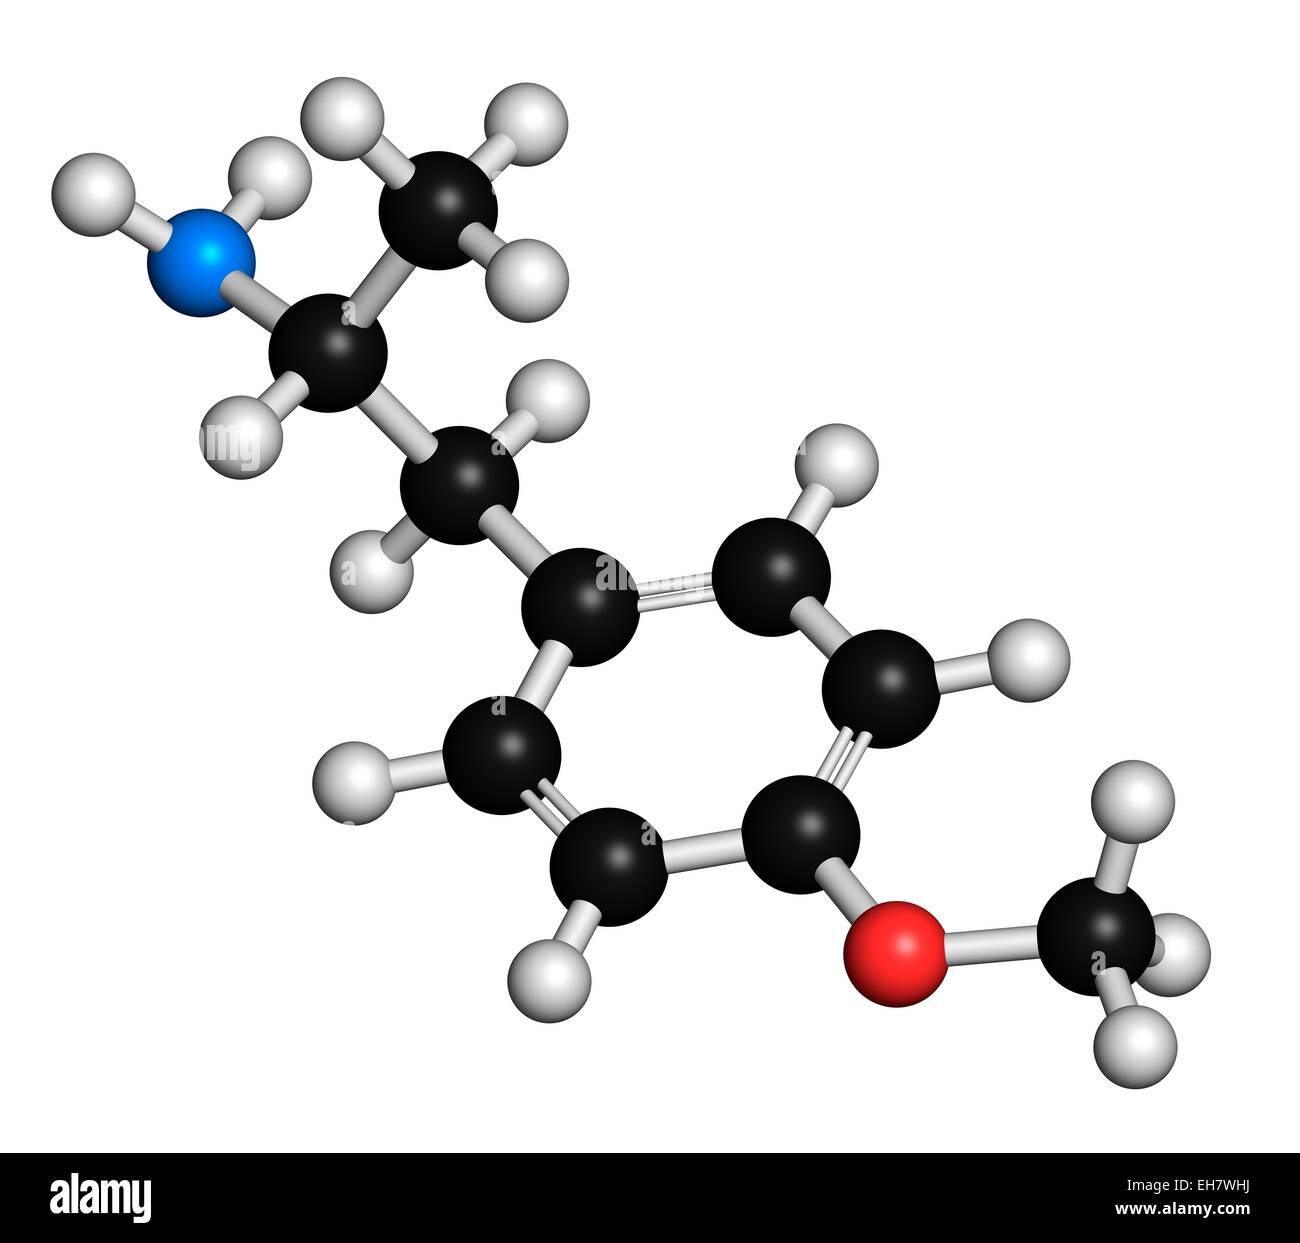 p-methoxyamphetamine hallucinogenic drug - Stock Image